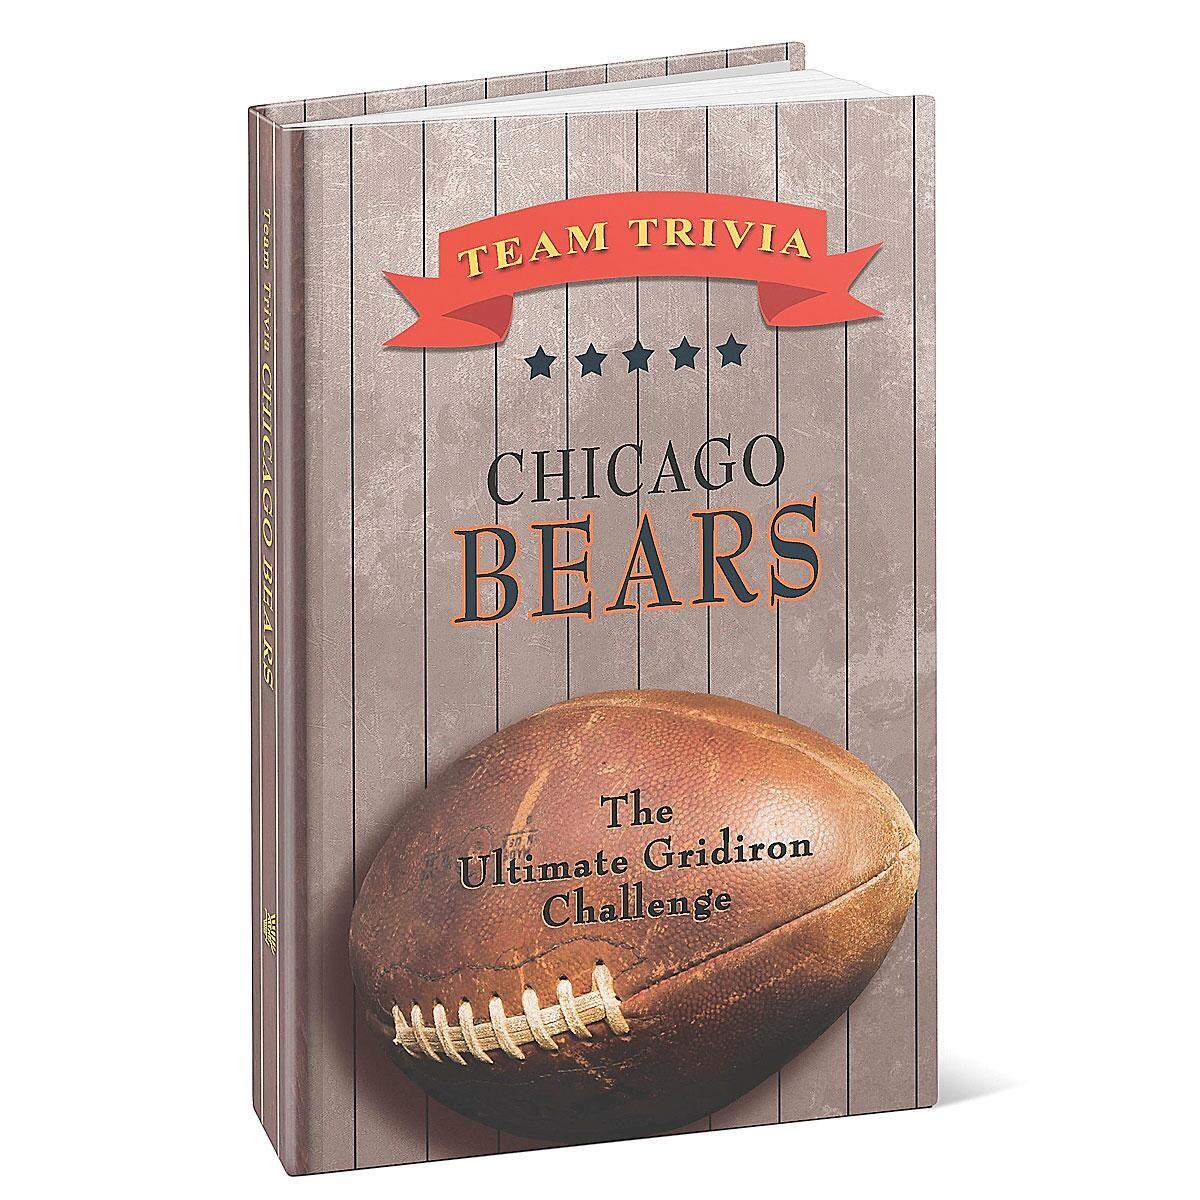 Chicago Bears NFL Team Trivia Book